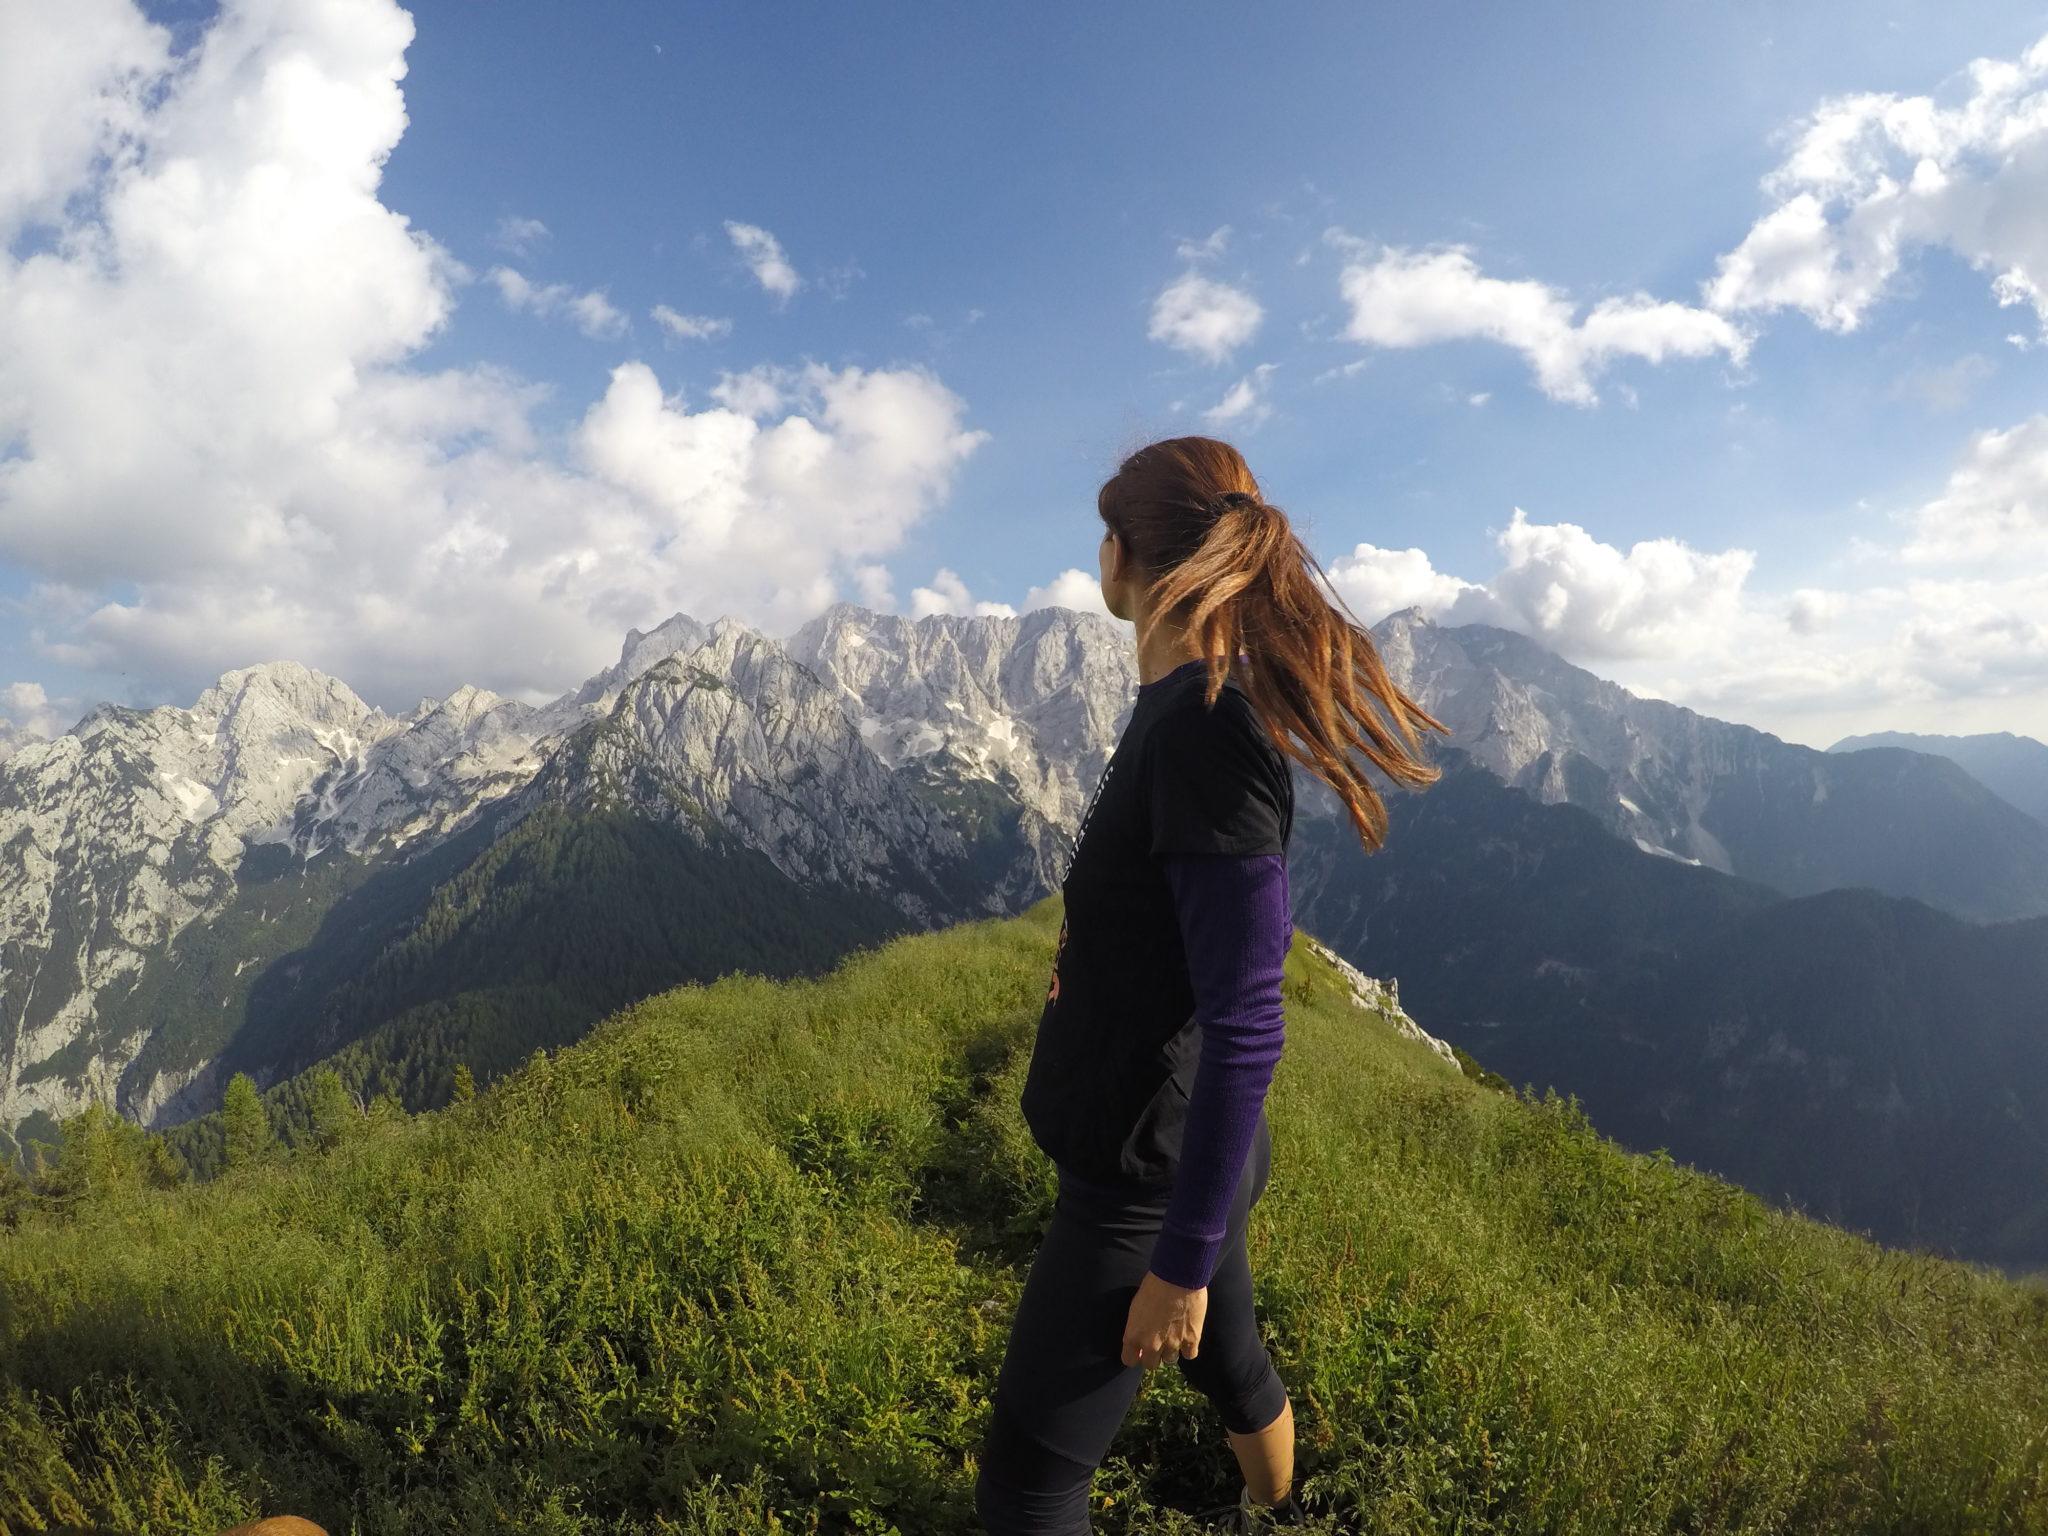 At the top of Goli Vrh, the Kamnik-Savinja Alps, Slovenia